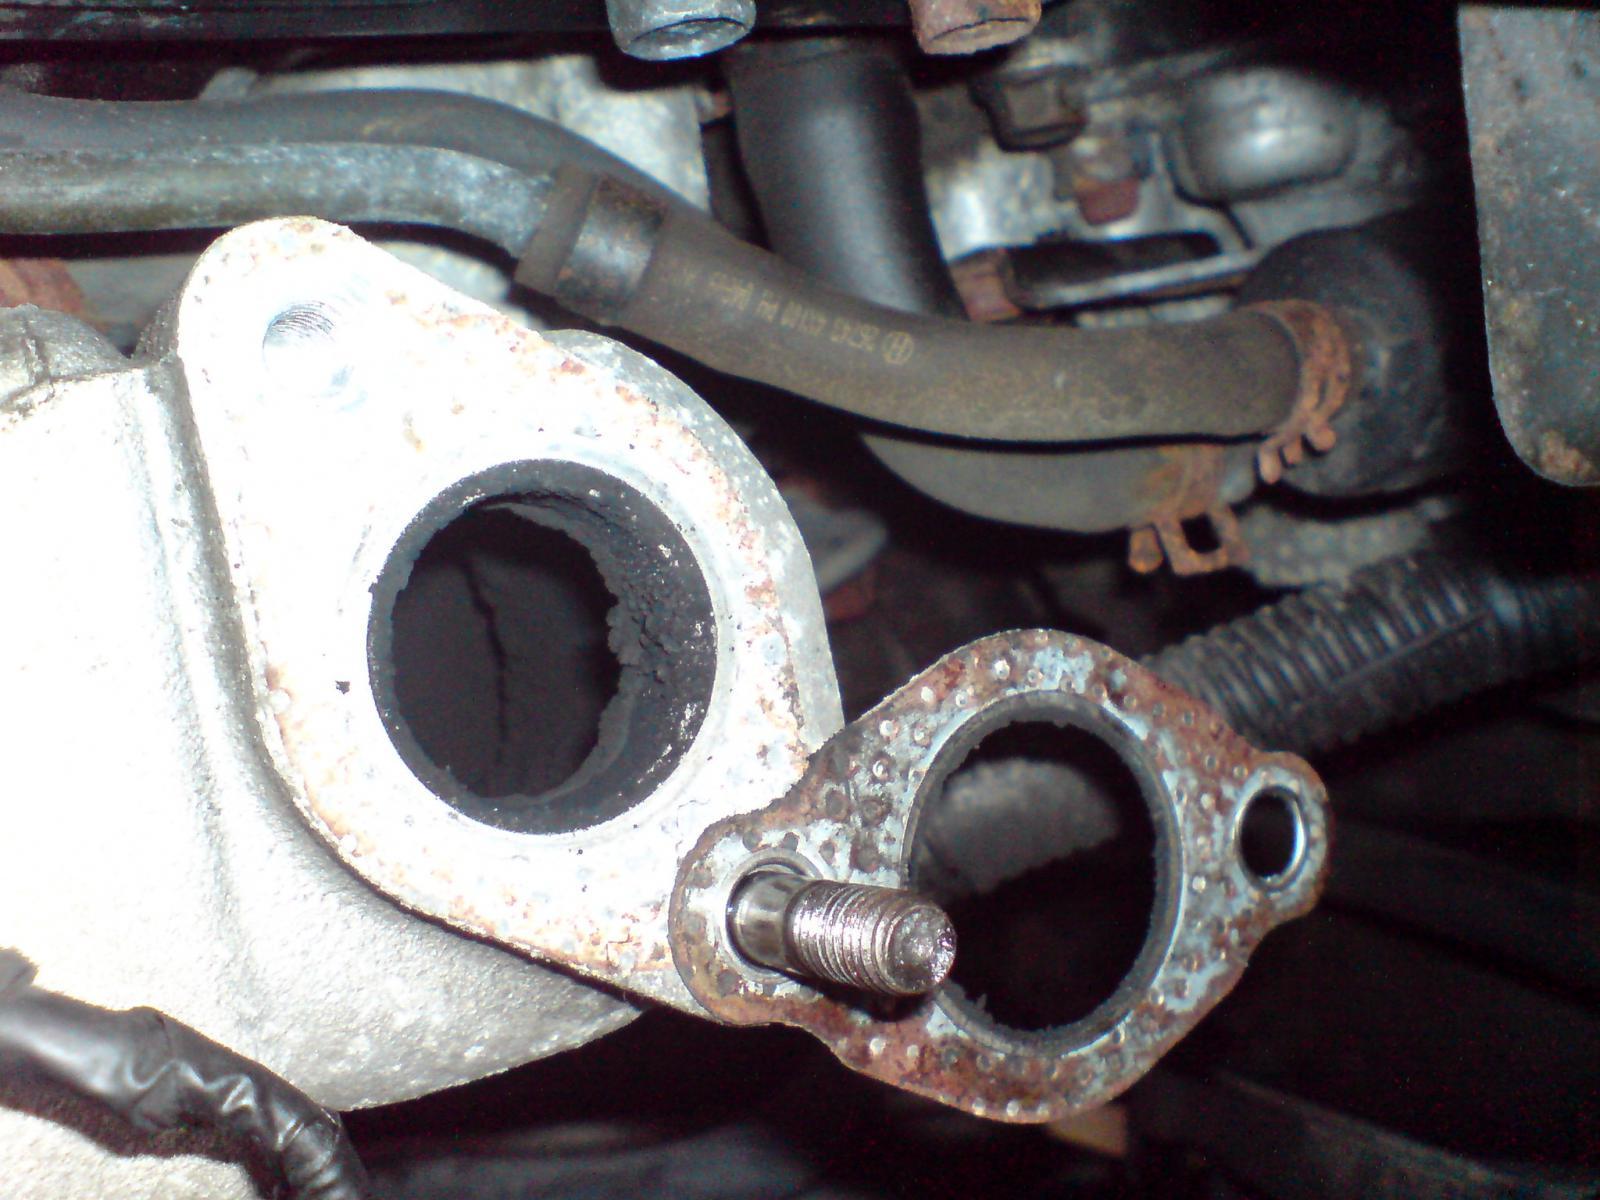 egr valve page 2 kia forumclick image for larger version name dsc01145 jpg views 38885 size 192 2